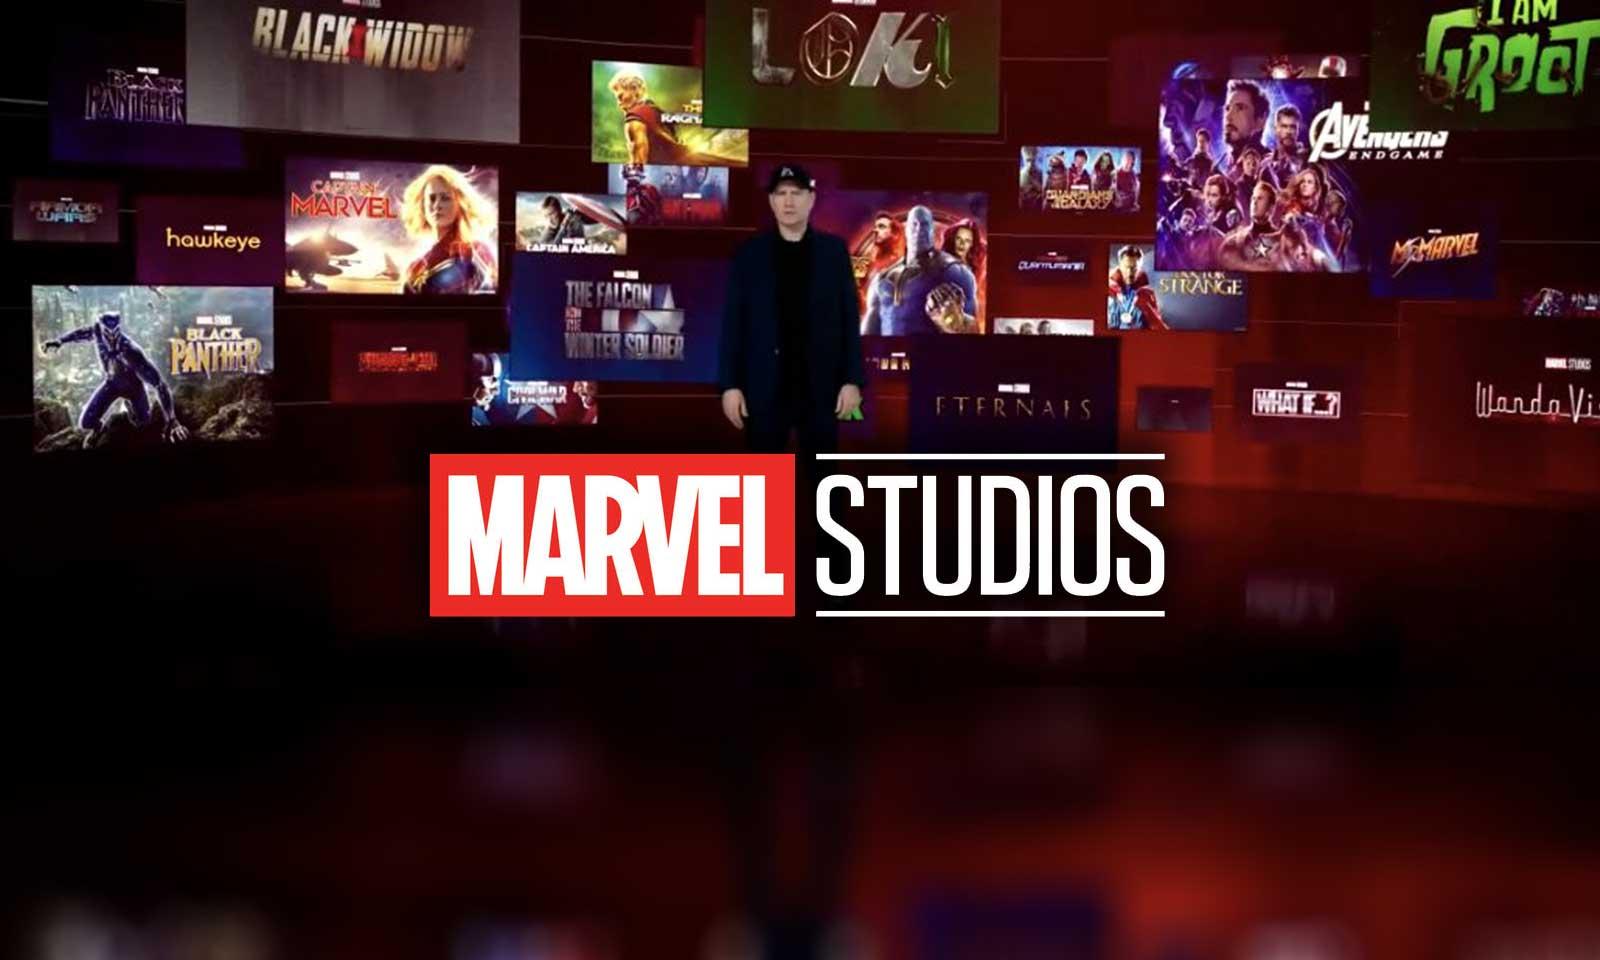 Marvel-Studios-Disney-Investor-Day-Anuncios